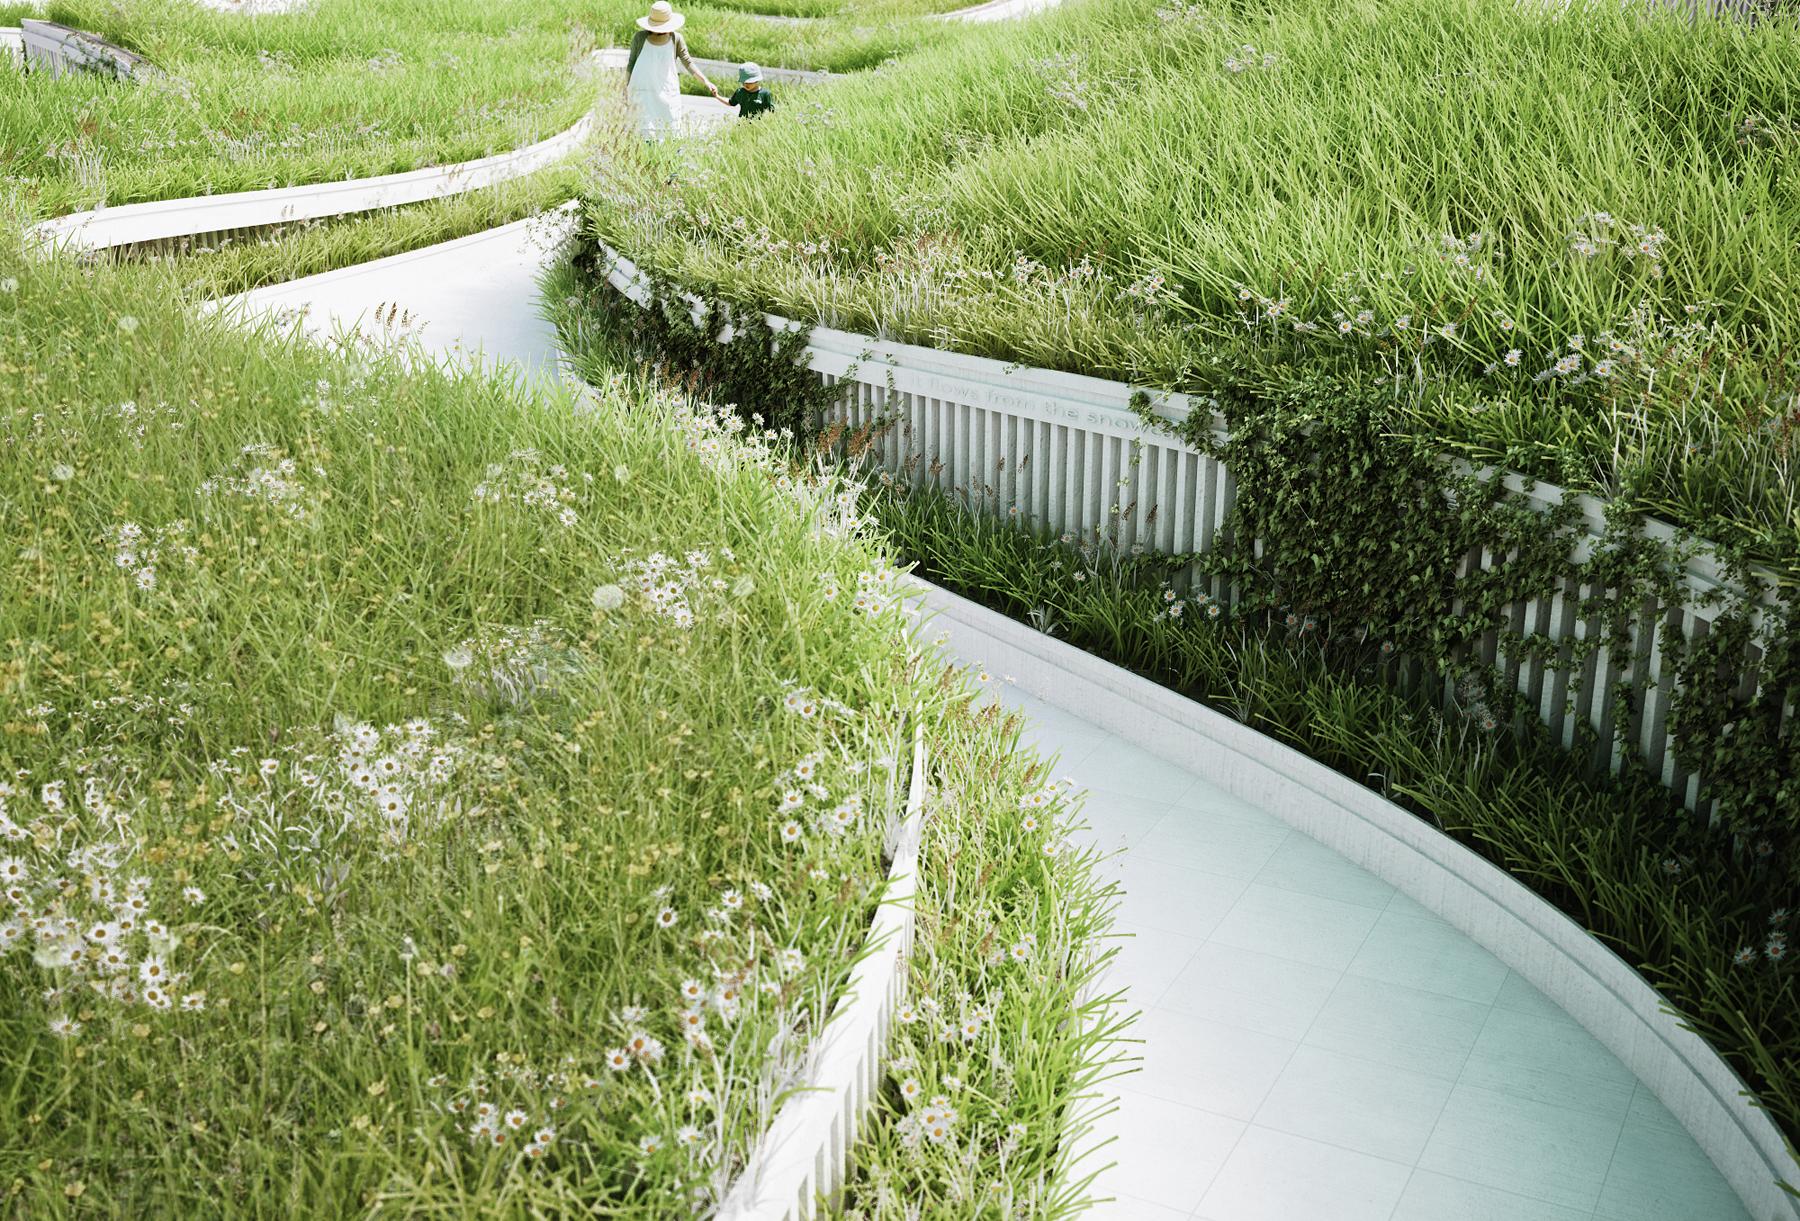 gallery of penda designs river-inspired landscape pavilion for china u2019s garden expo